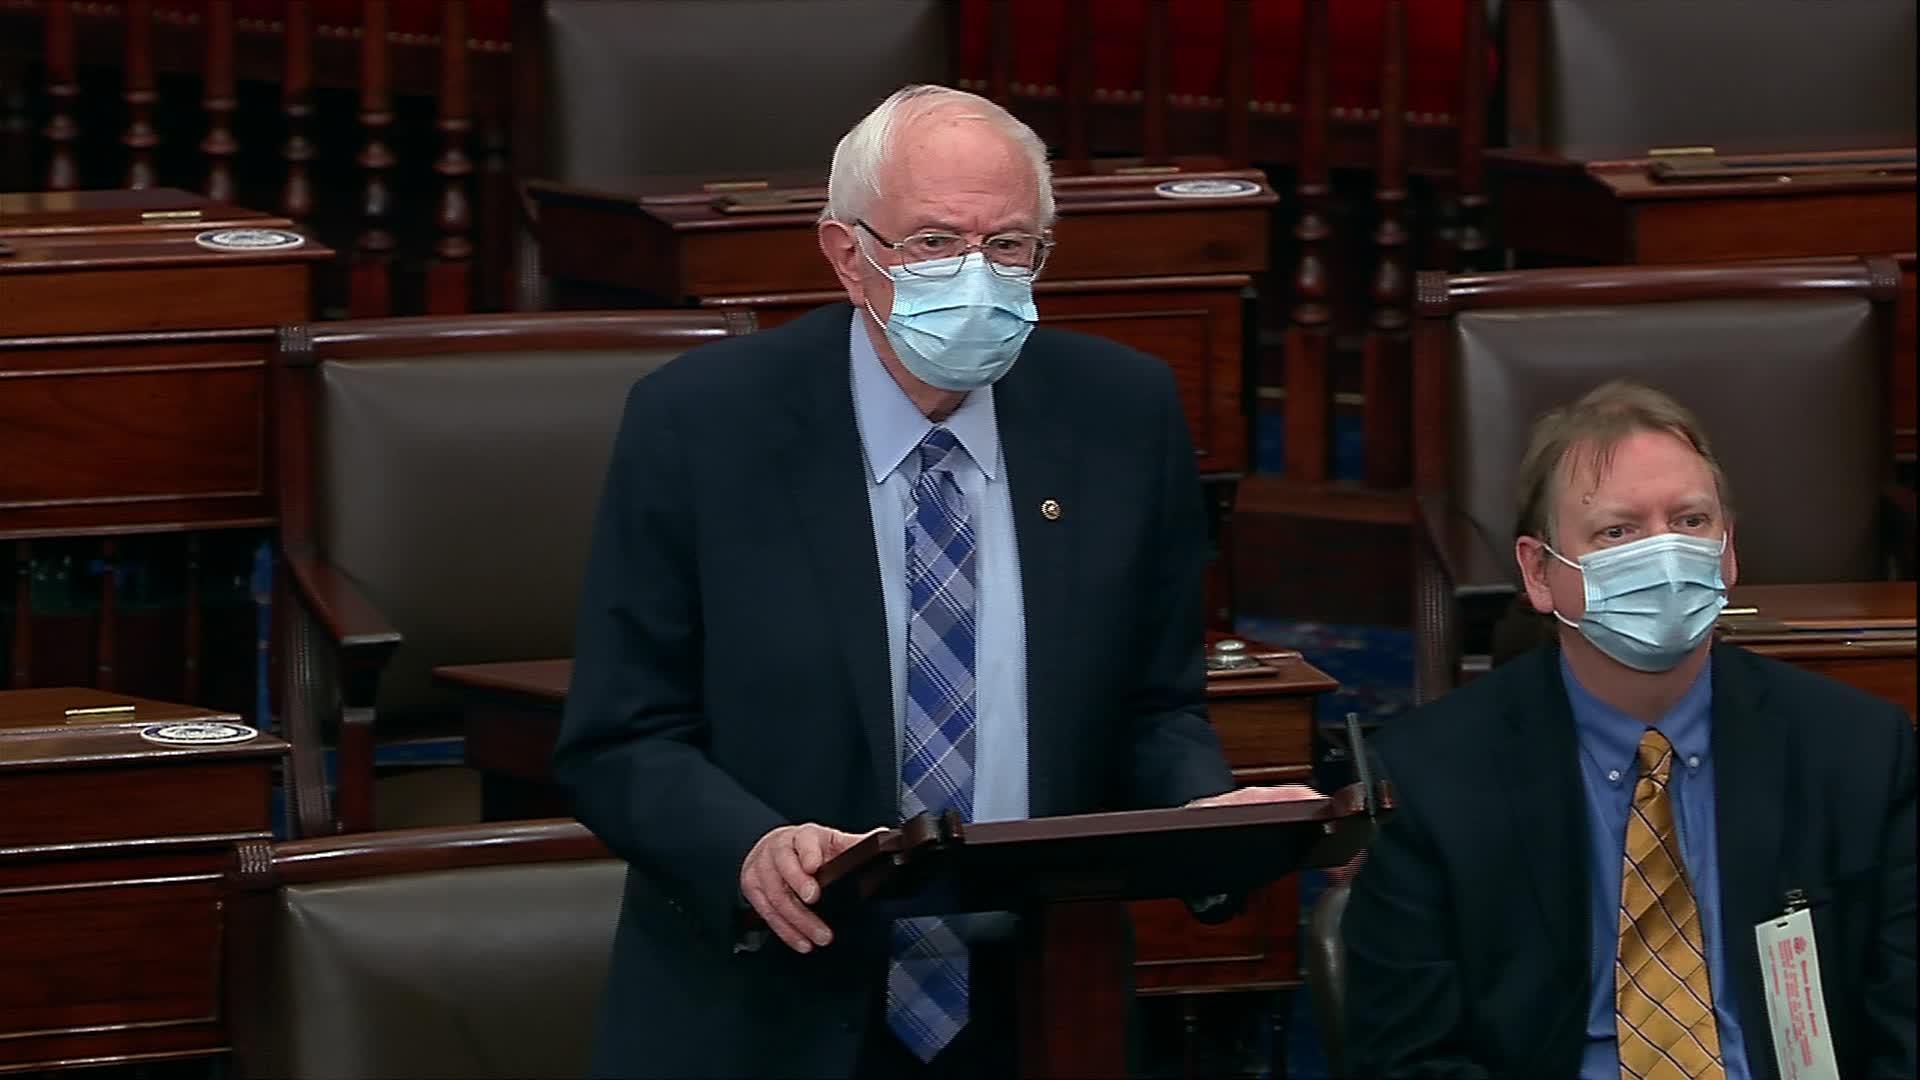 Sen. Bernie Sanders speaks on the Senate floor in Washington, DC, on December 29.